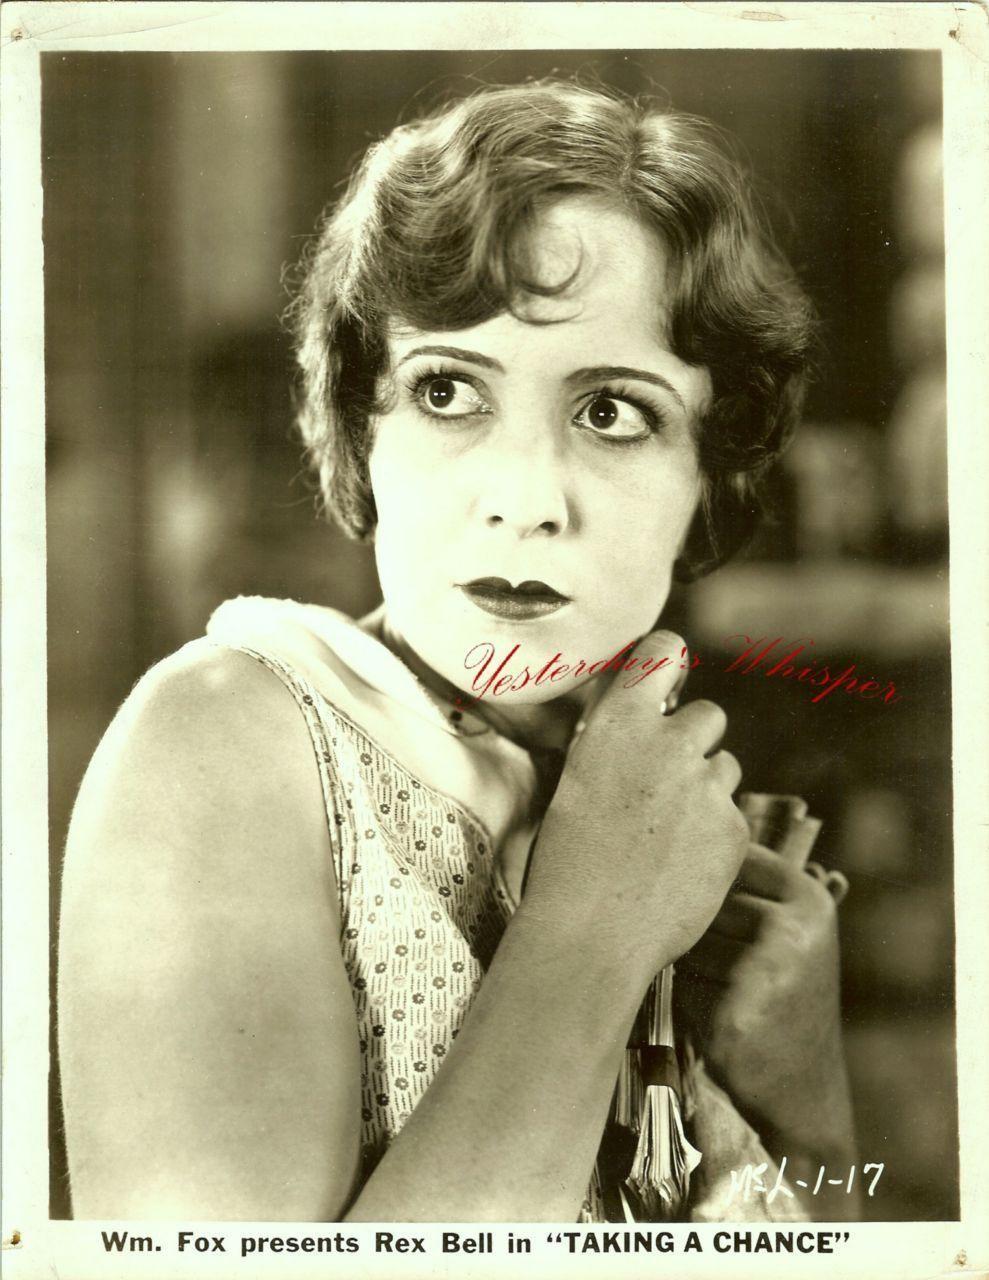 Rosemarie Gil (b. 1942),Jim Carter (born 1948) XXX clips Derek Jacobi (born 1938),Marie Wainwright